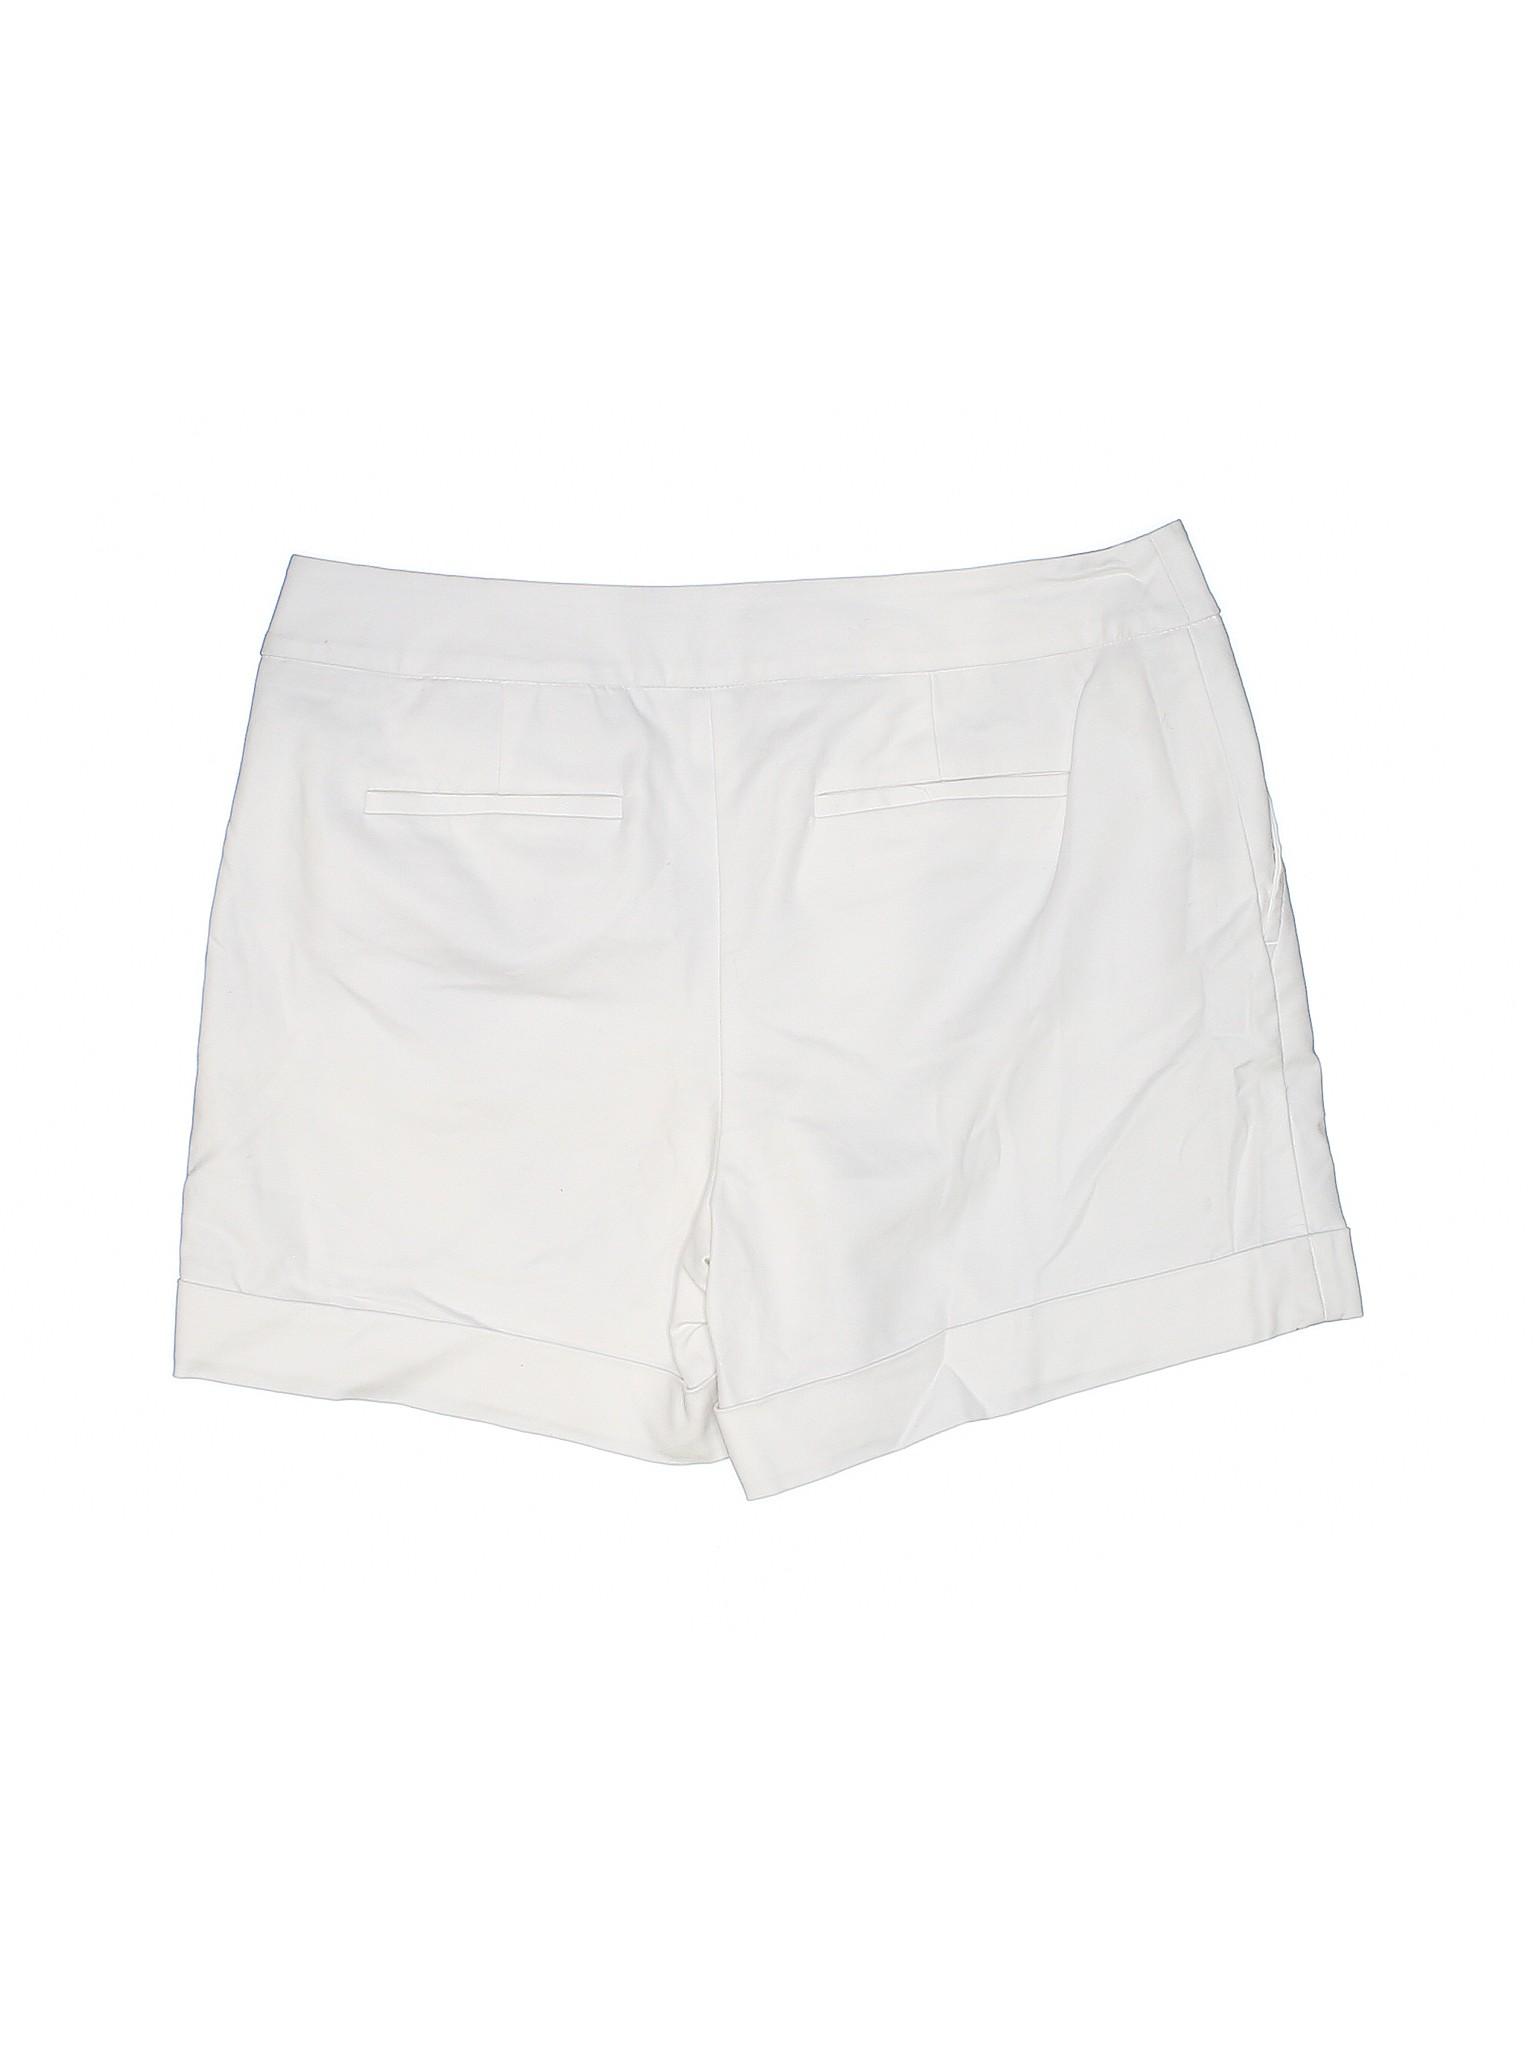 winter Apt Khaki 9 Shorts Leisure nXq41Bvxvw